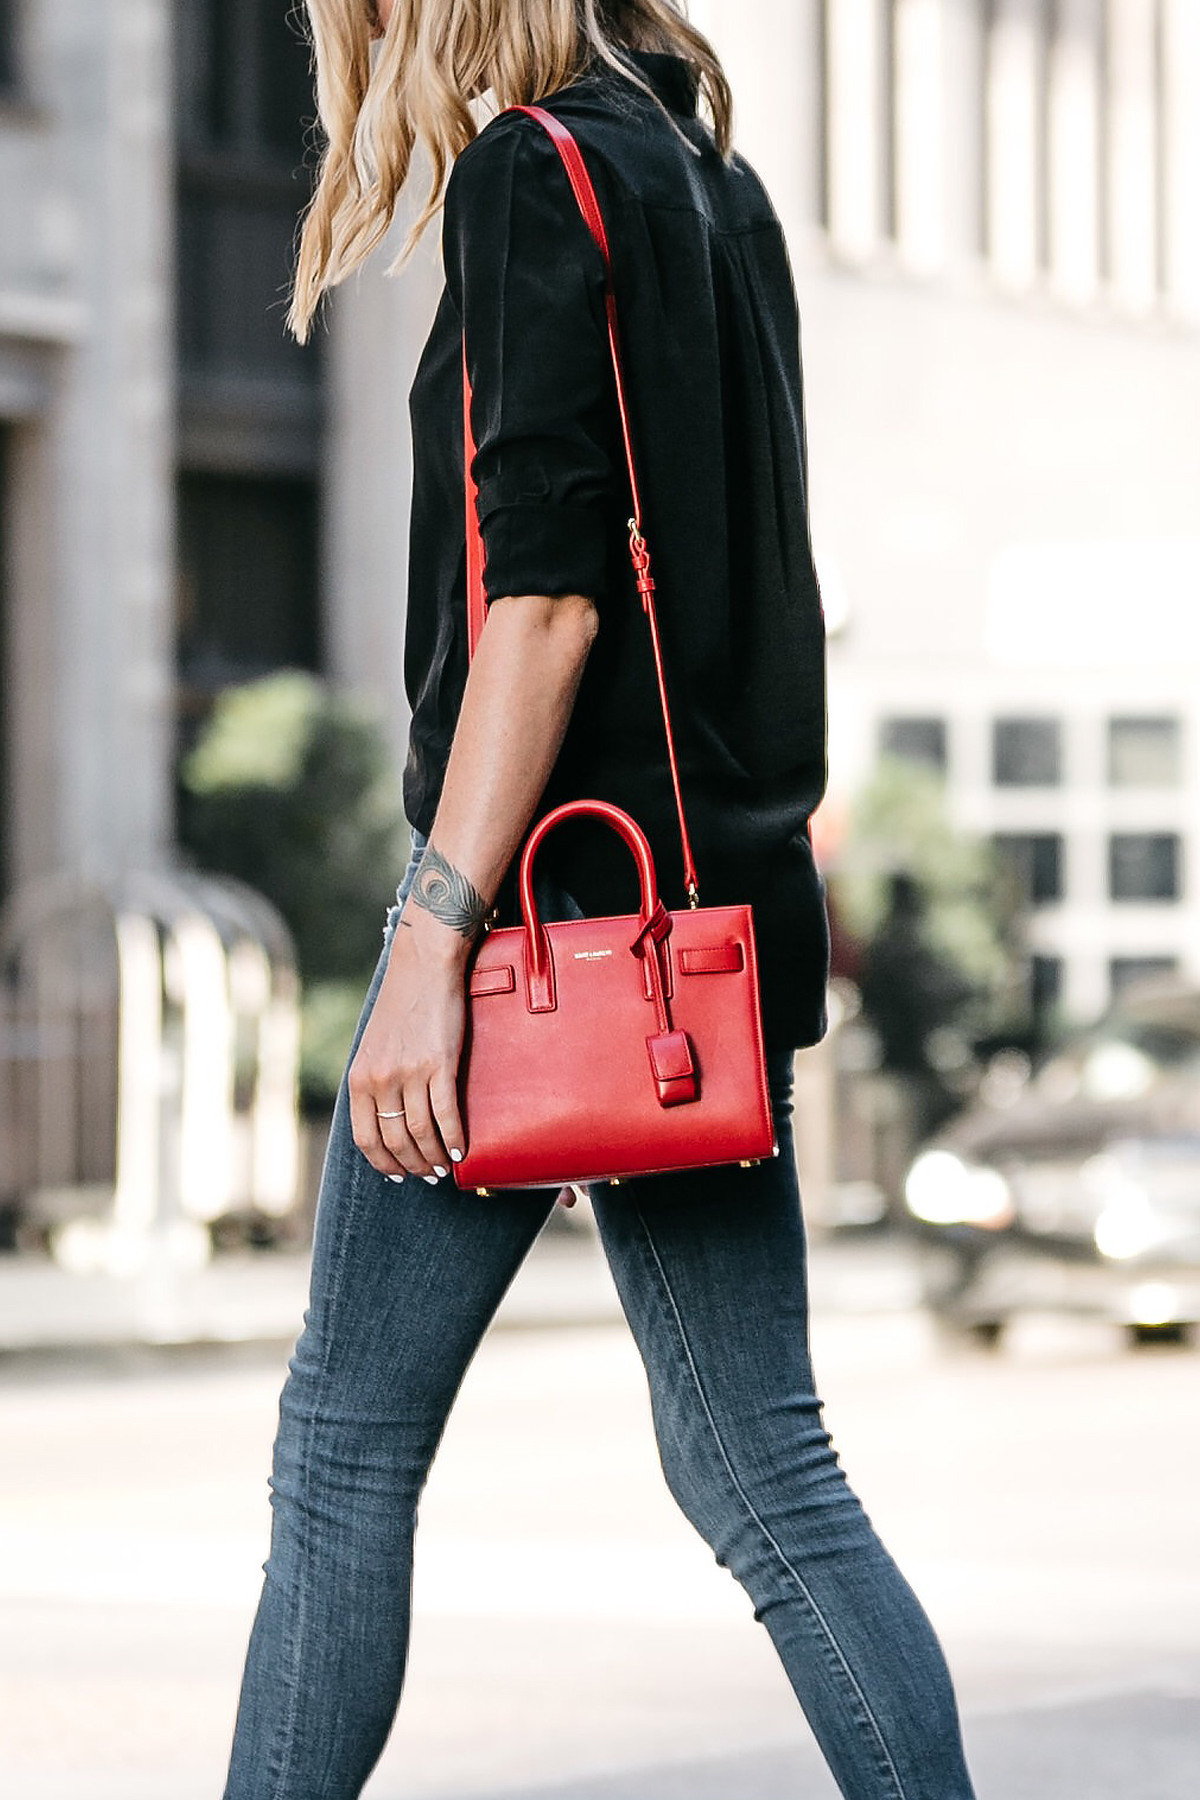 Saint Laurent Sac de Jour Red Handbag Black Button Up Shirt Denim Skinny Jeans Fashion Jackson Dallas Blogger Fashion Blogger Street Style